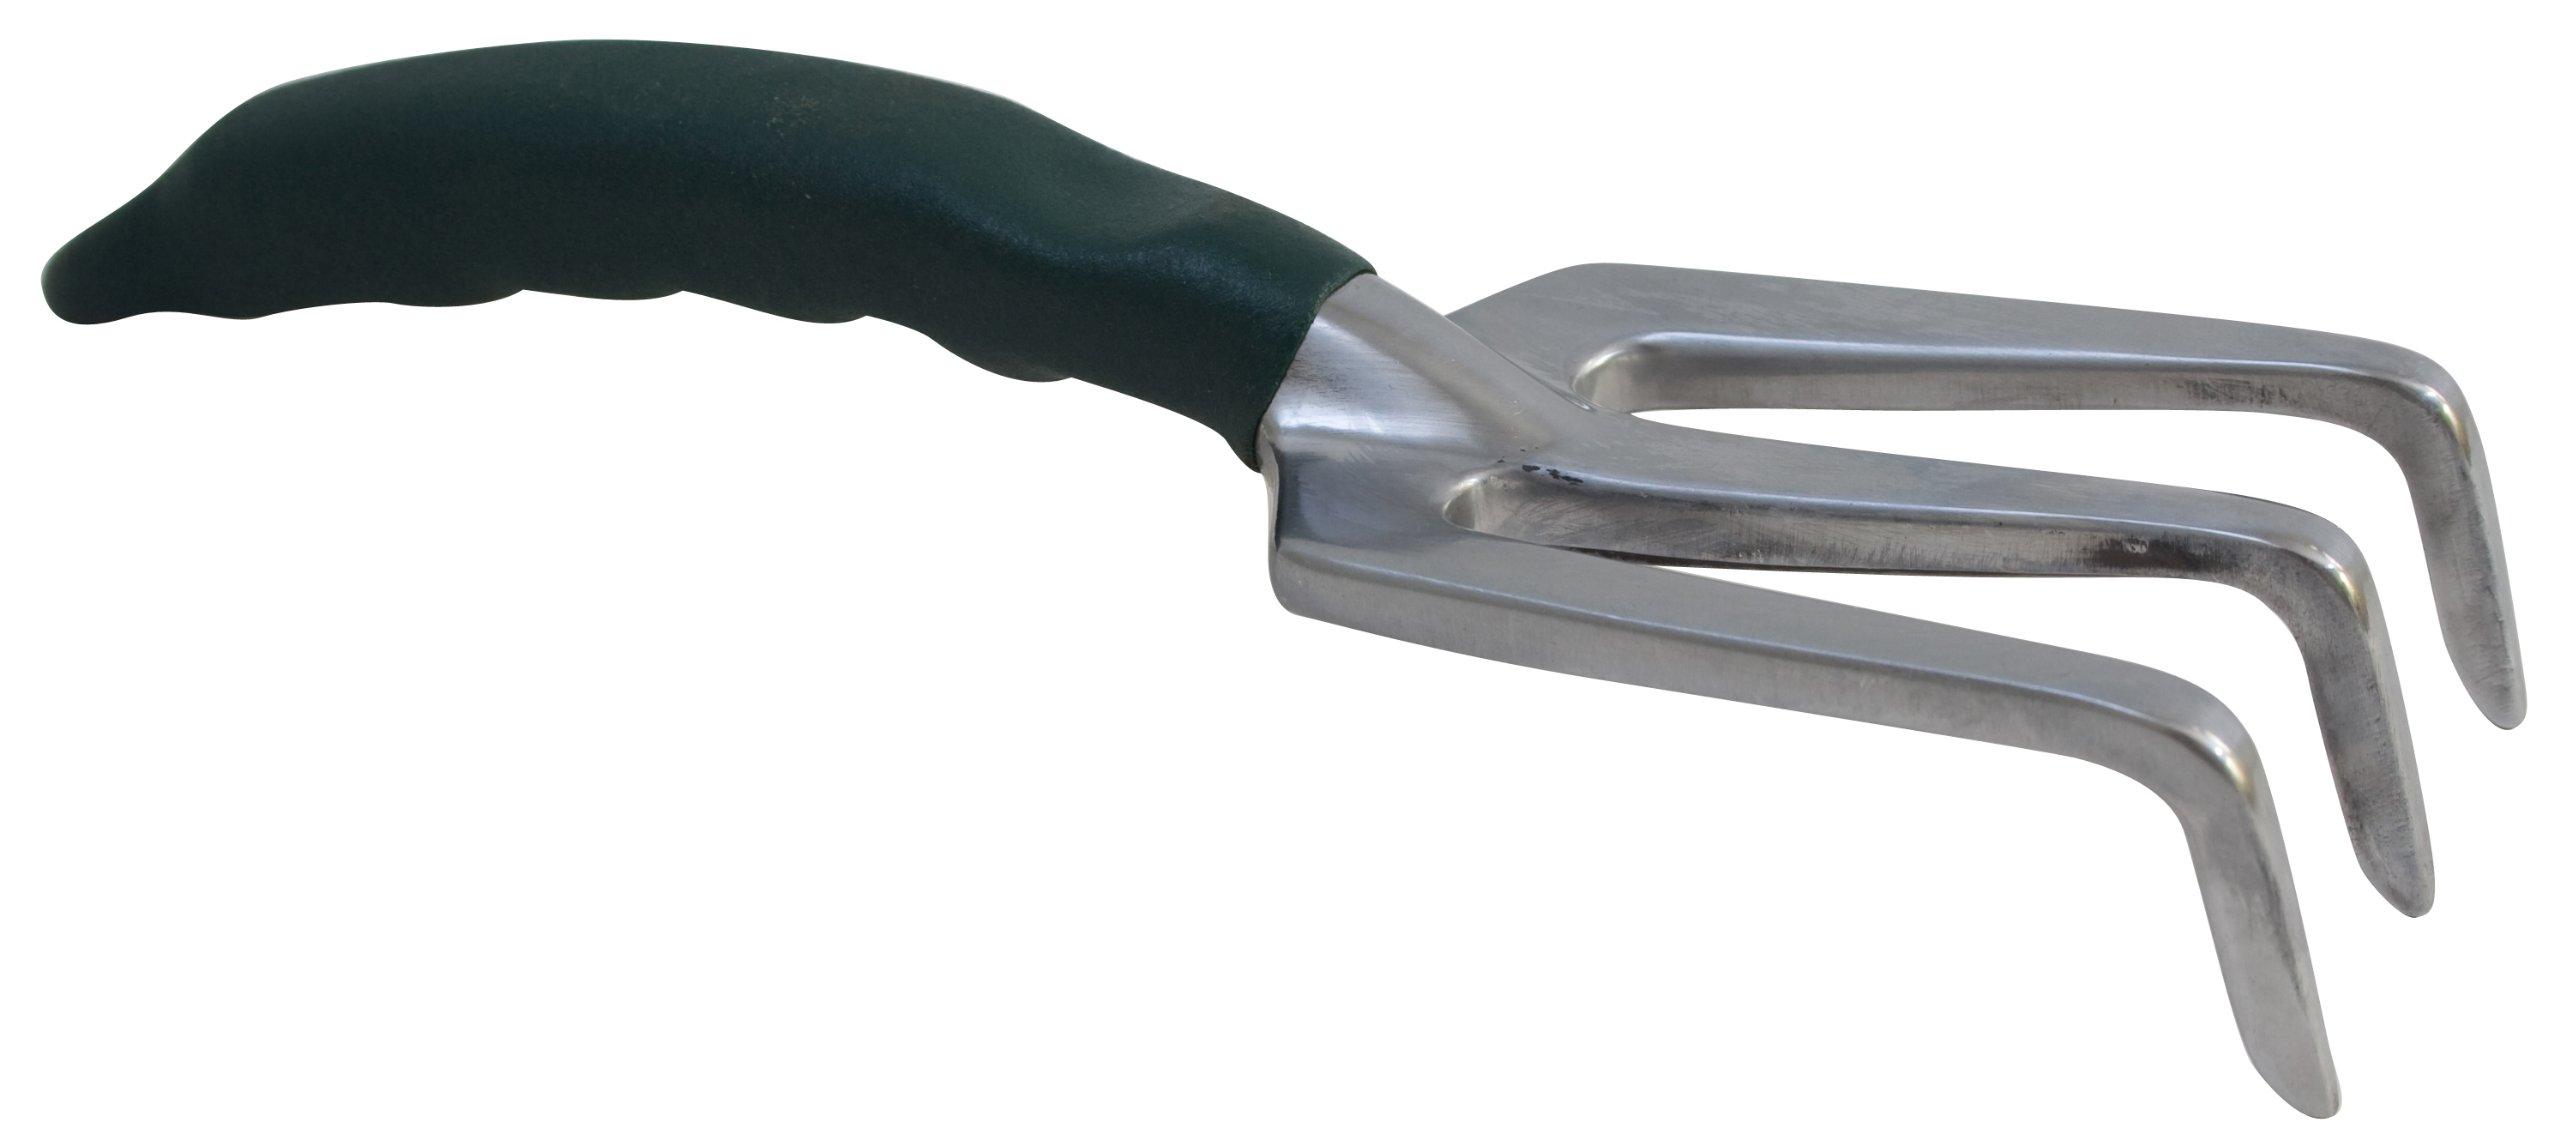 Flexrake LRB439A Cast Aluminum Hand Cultivator